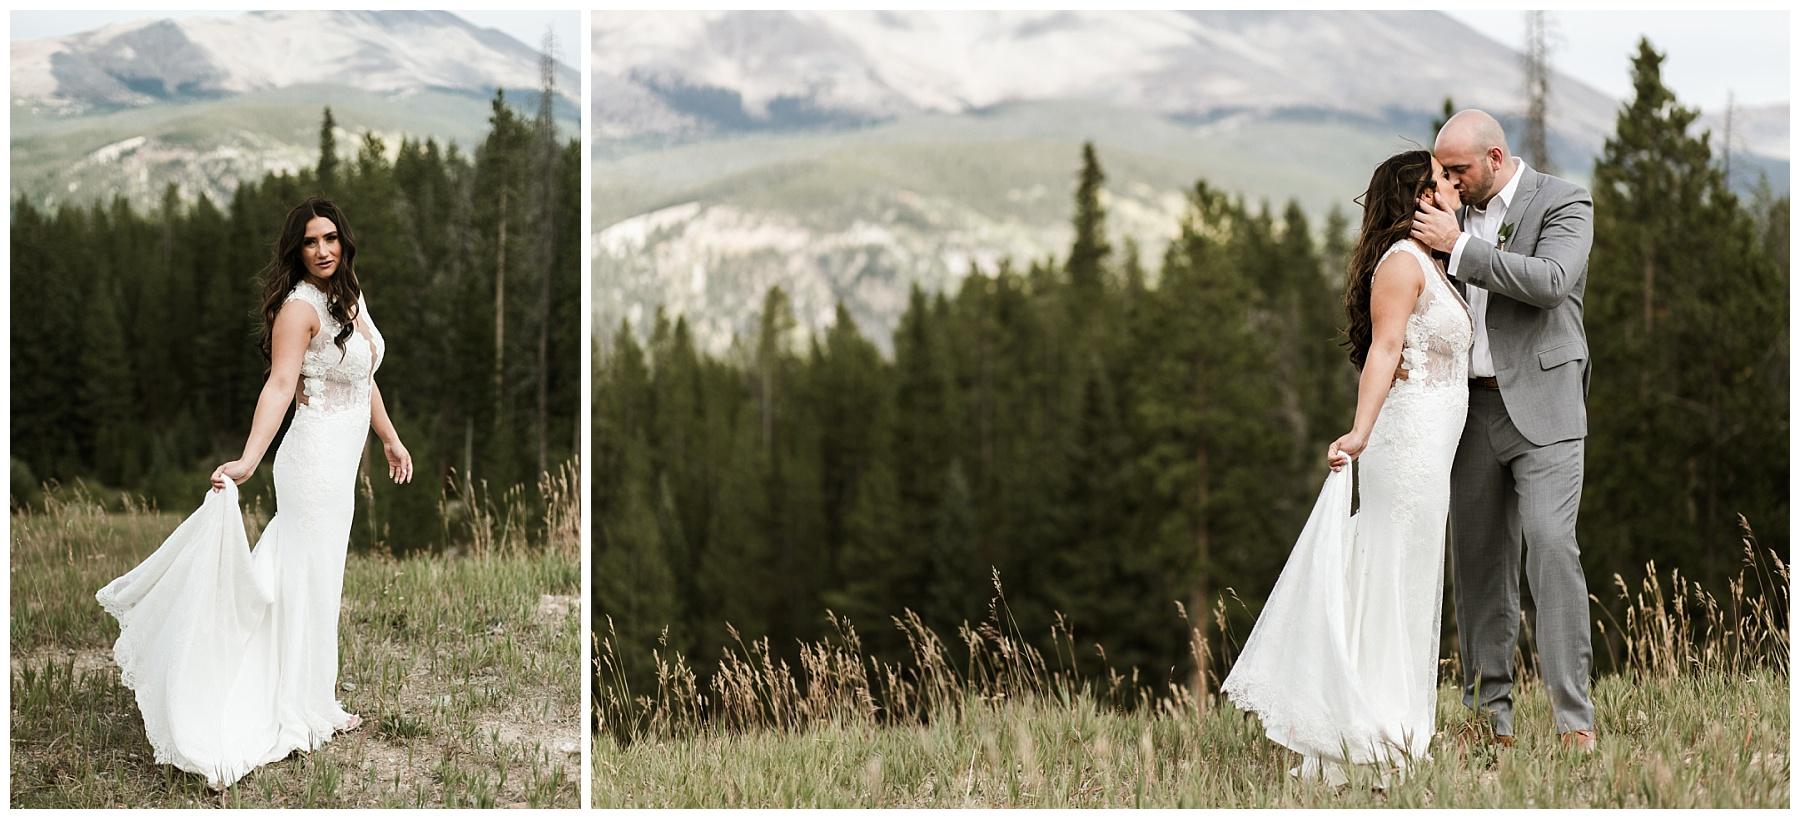 Katesalleyphotography-198_married in Breckenridge.jpg